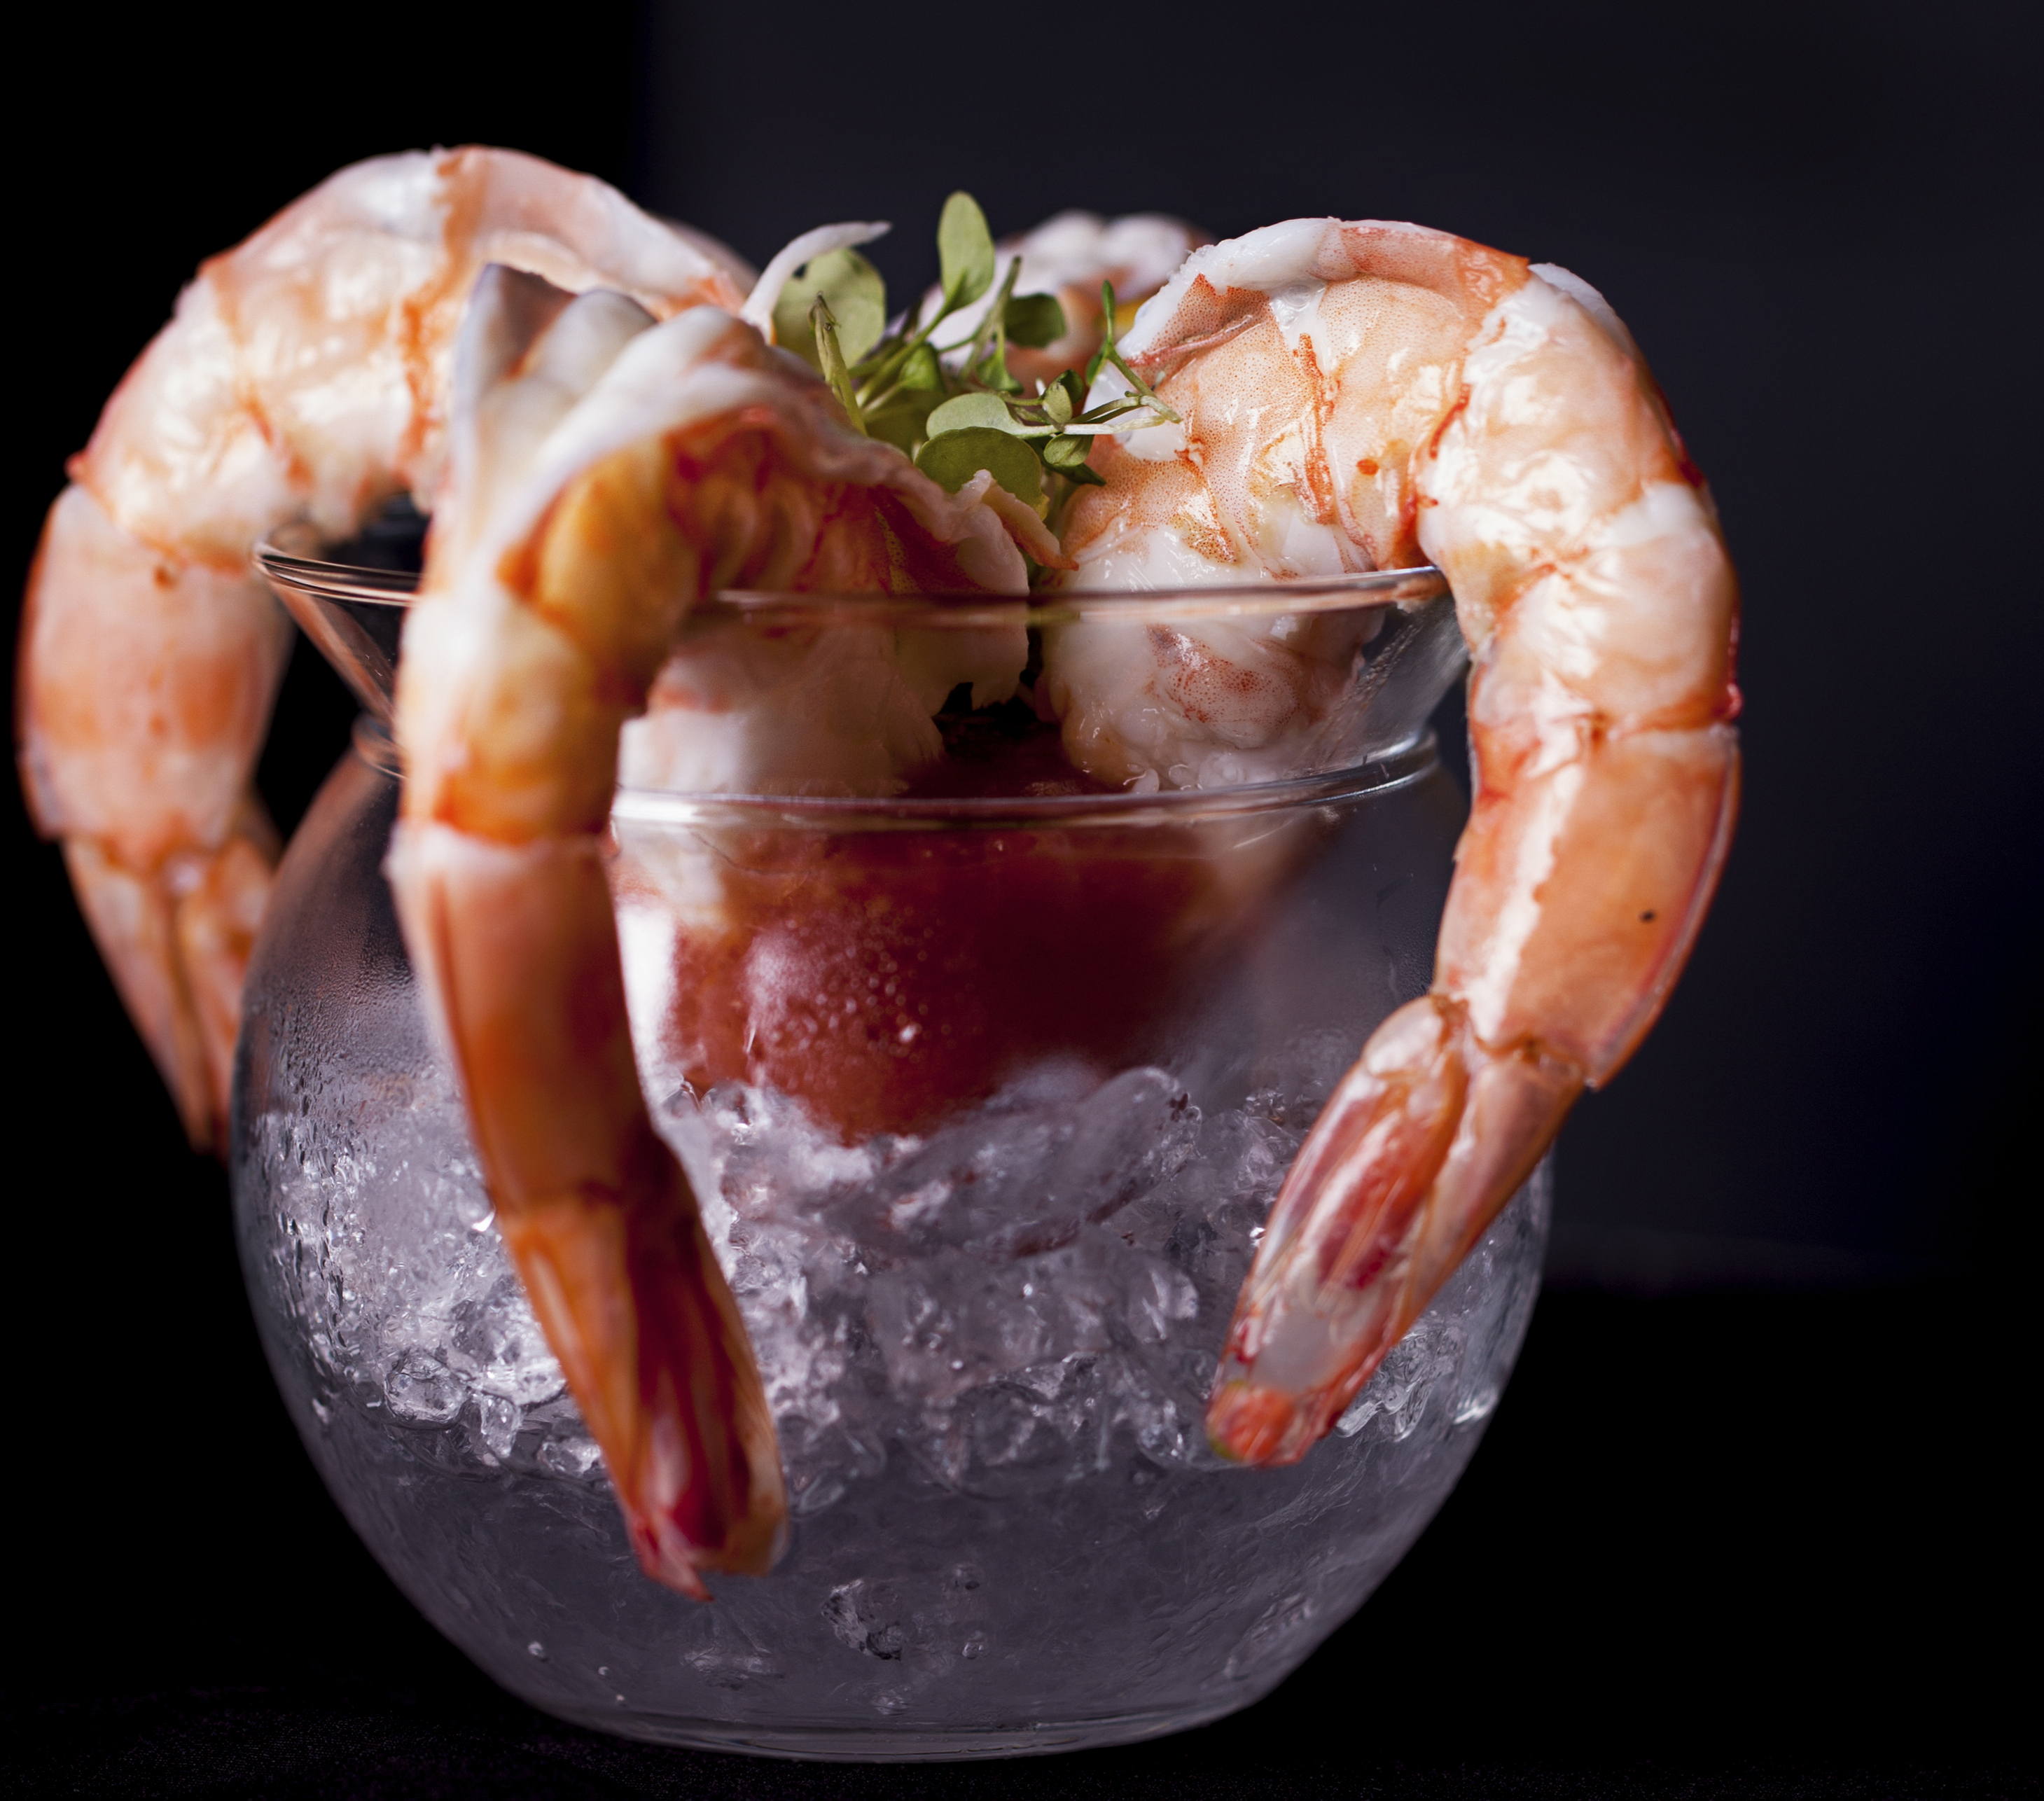 recipe: cocktail sauce for shrimp with horseradish recipe [9]